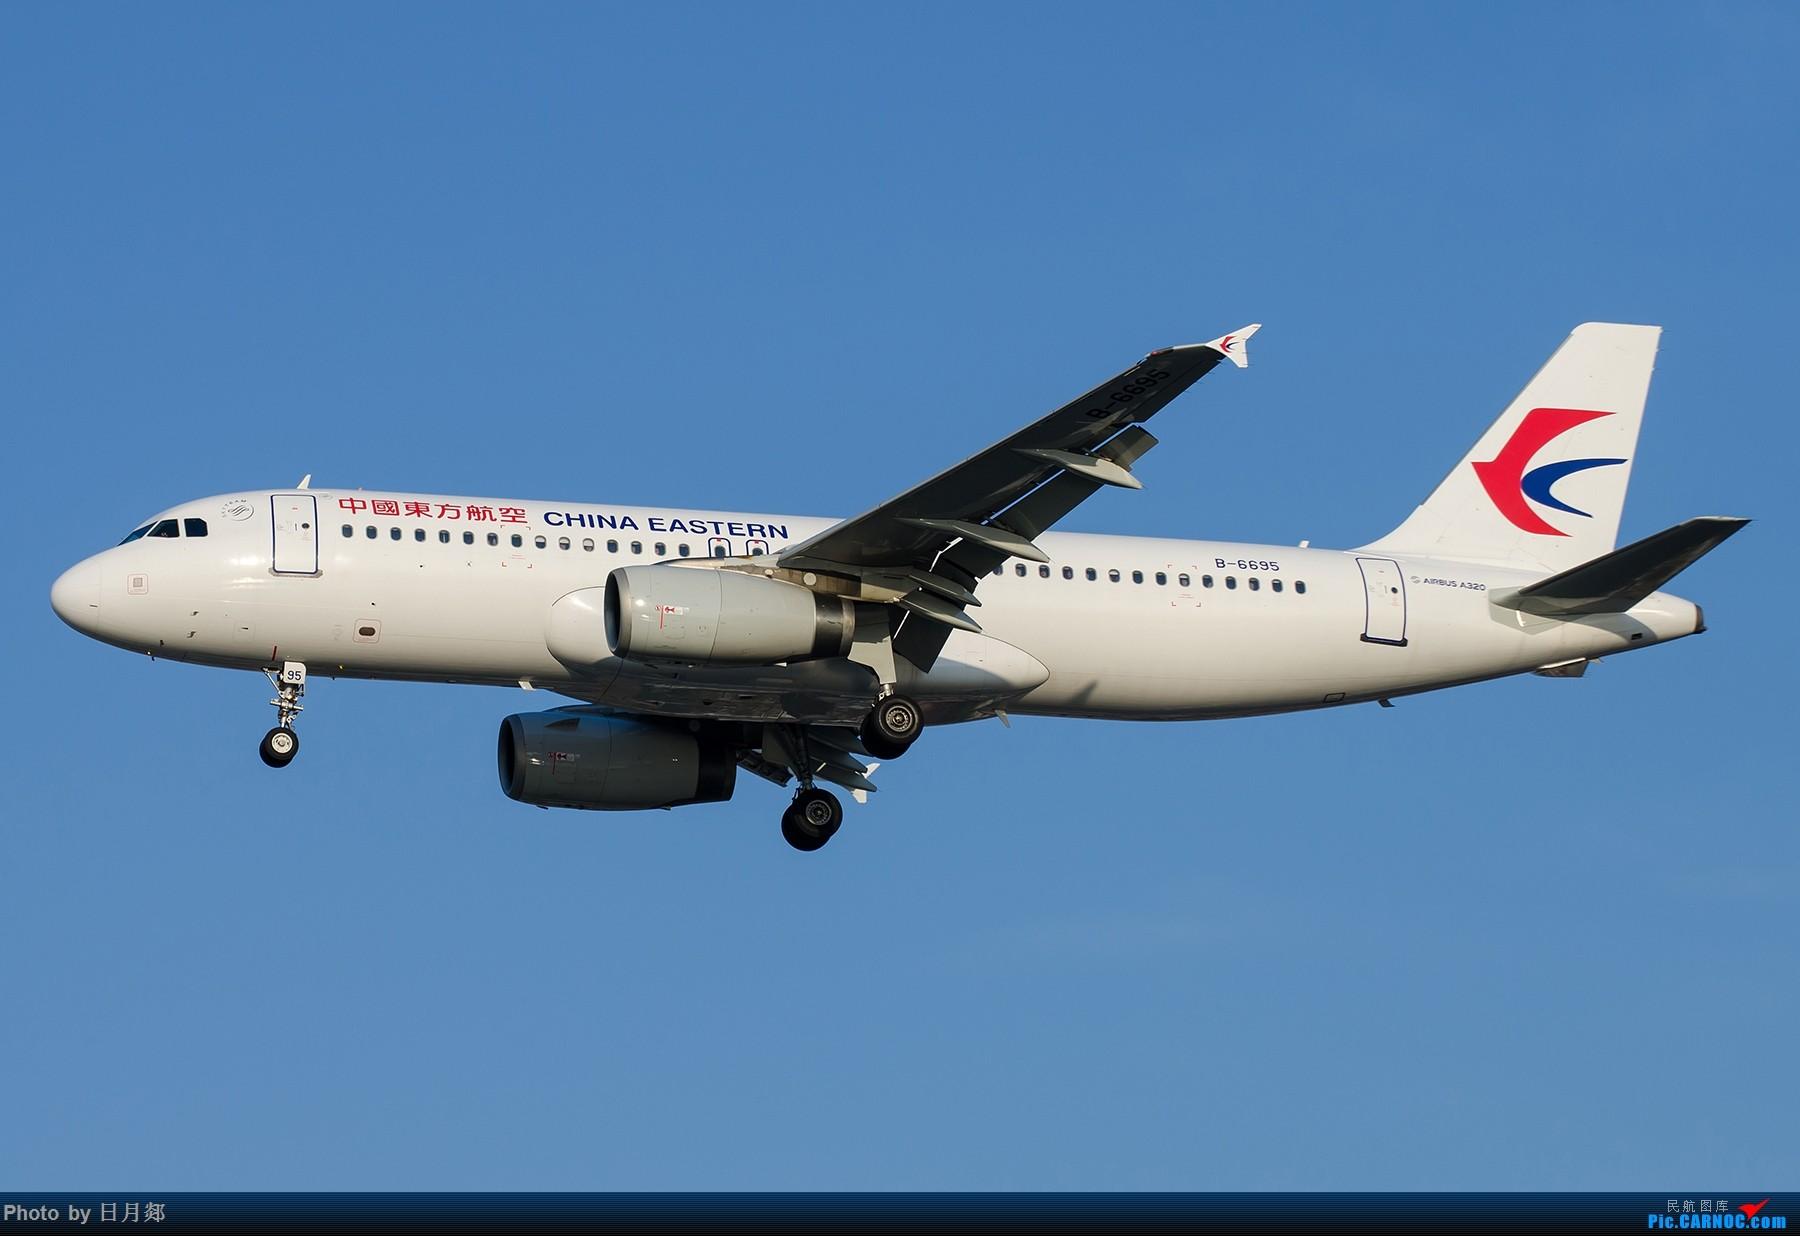 Re:[原创]【SHA拍机*1800大图】轻度污染来临前宝贵的蓝天,且拍且珍惜 AIRBUS A320-200 B-6695 中国上海虹桥国际机场